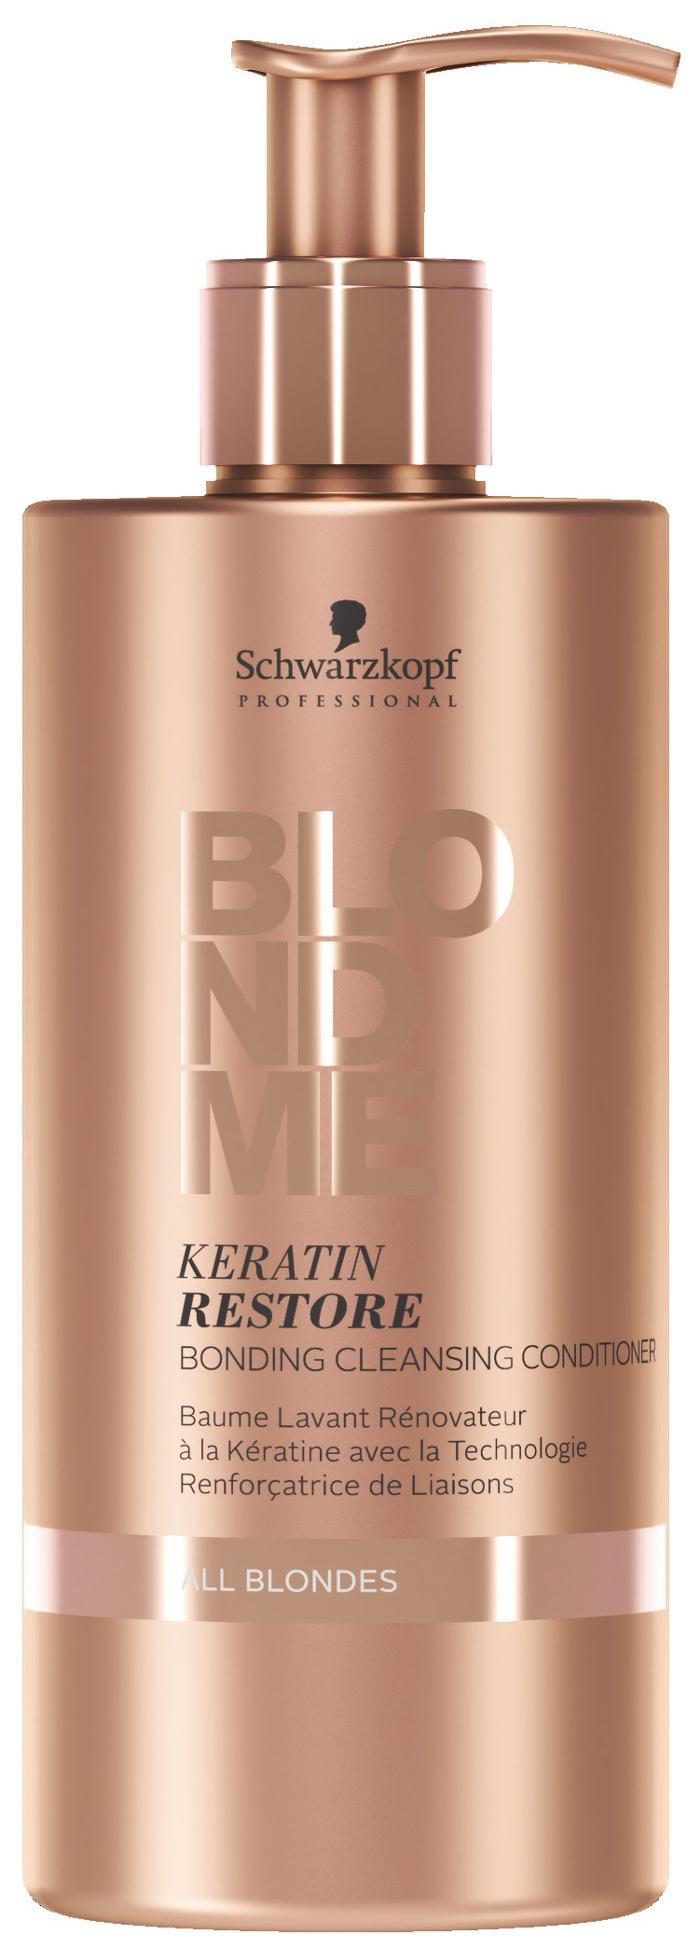 Кондиционер для волос Schwarzkopf Blondme Keratin Restore Bonding очищающий 500 мл